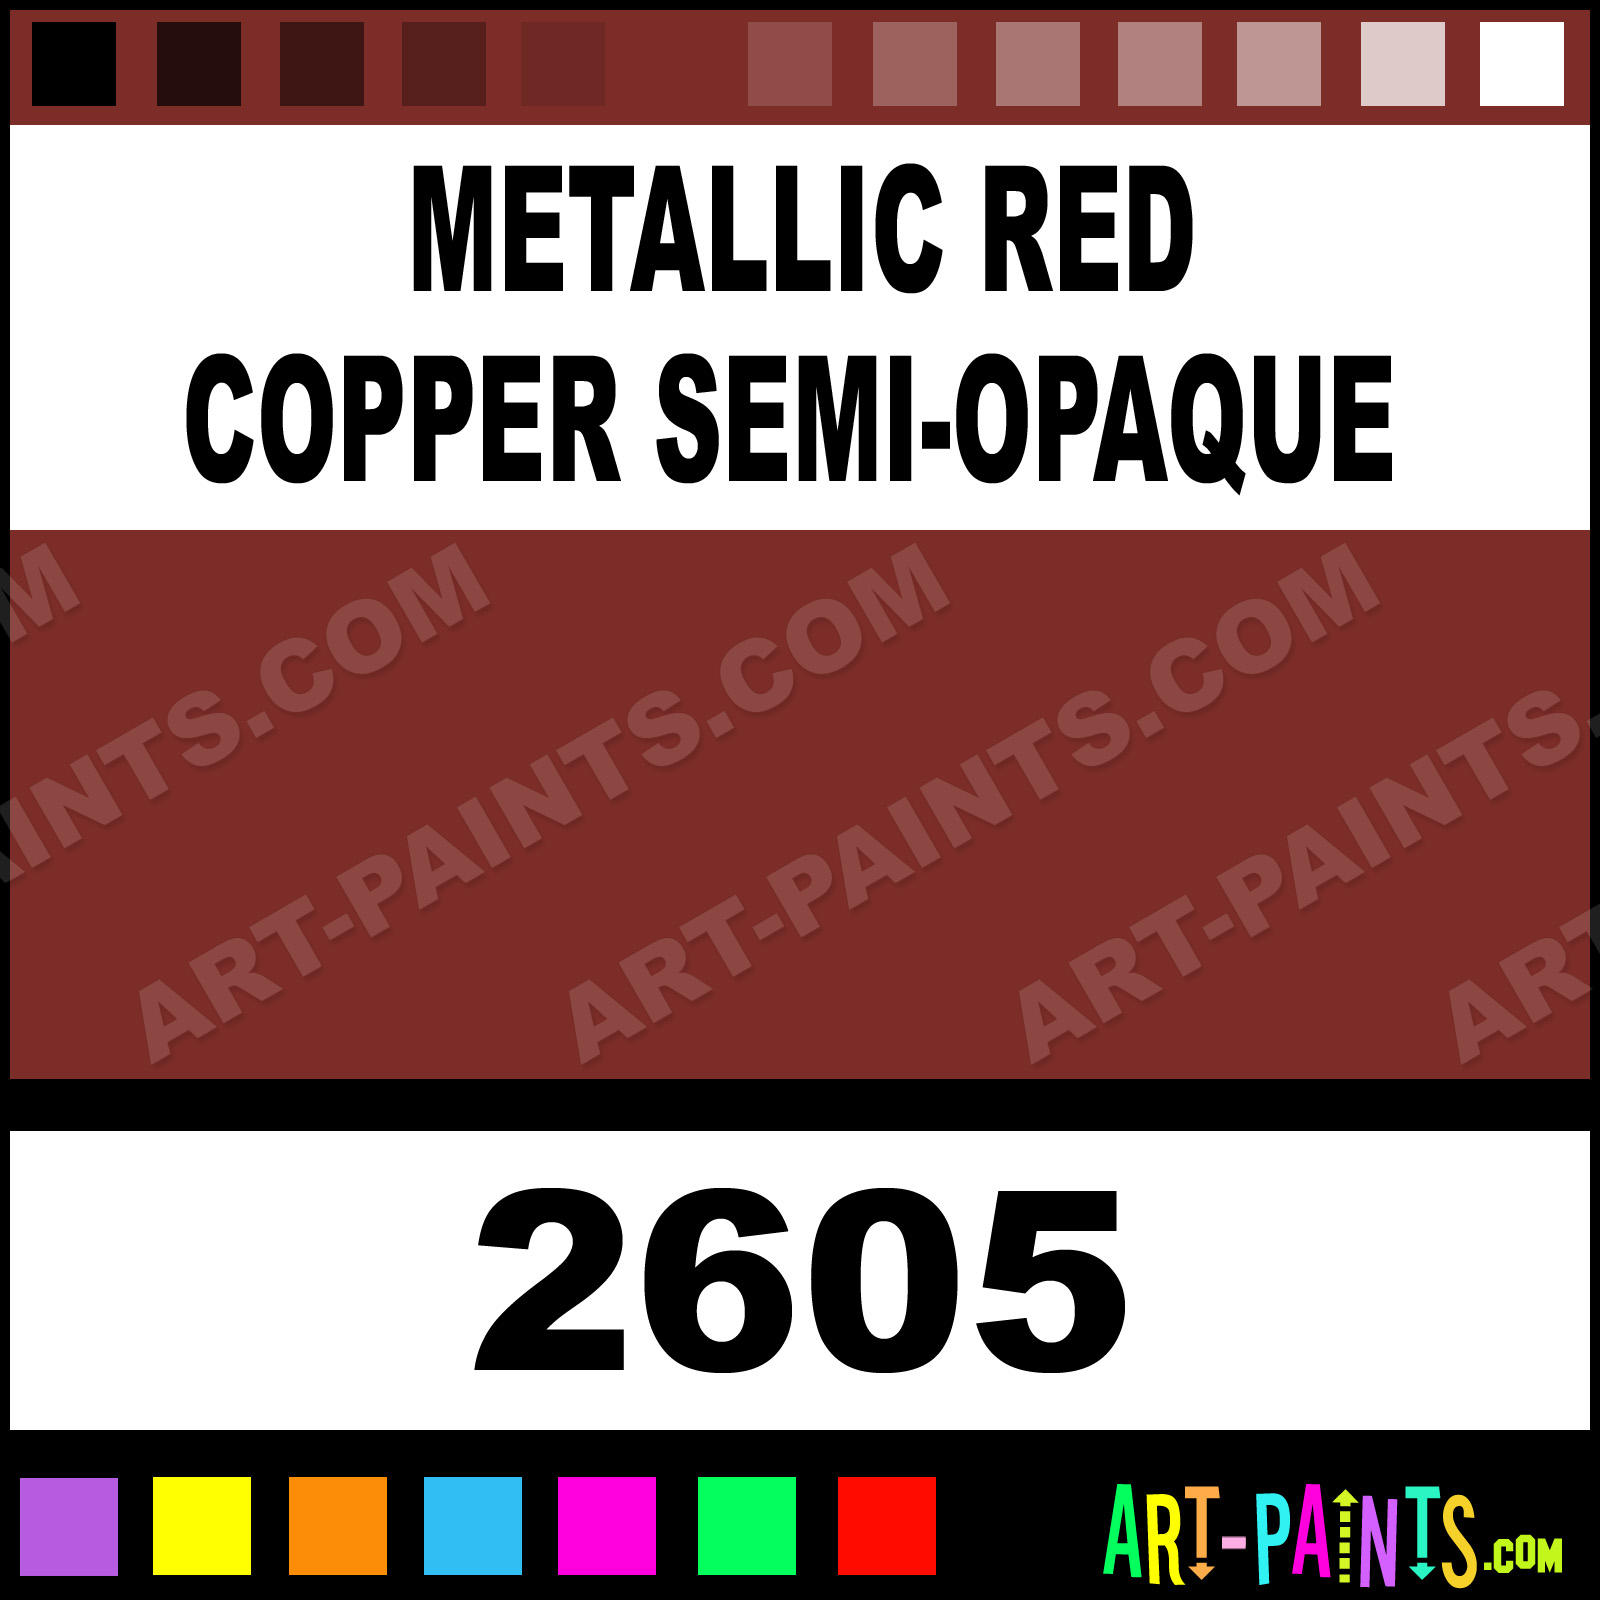 Semi opaque color delta ceramcoat paint 7b2c27 art paints com